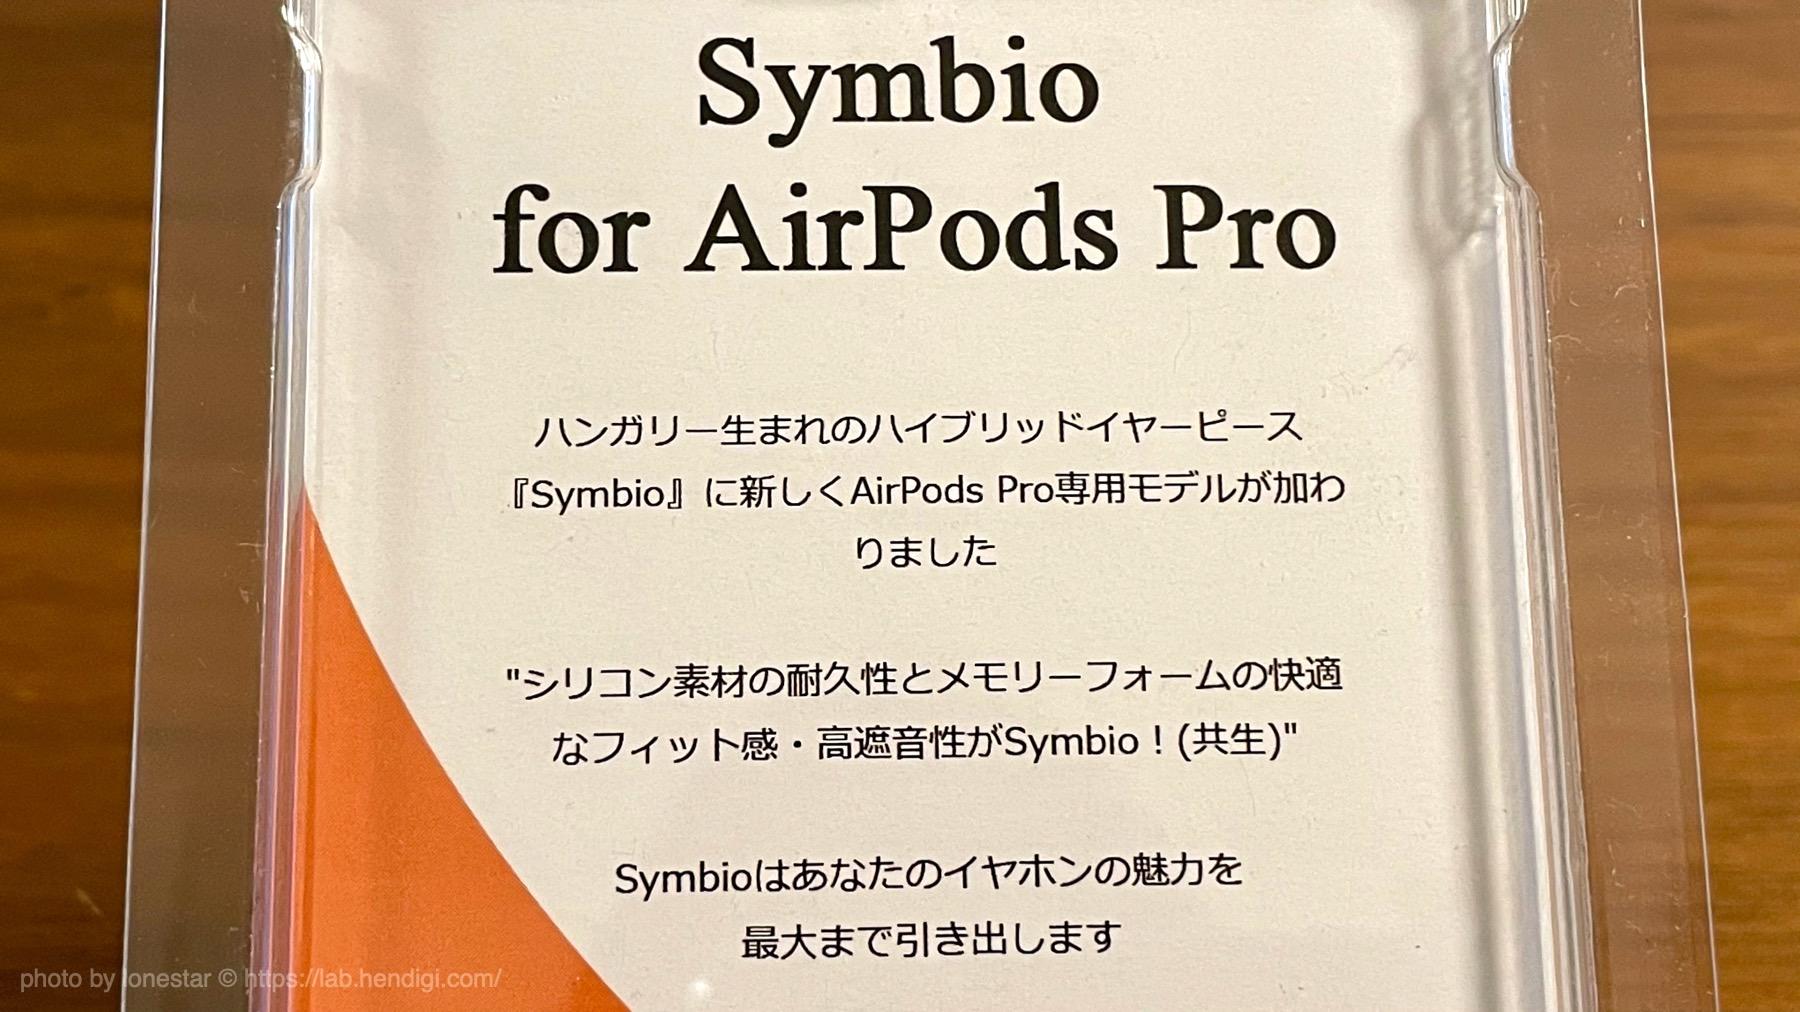 Symbio AirPods Pro 専用モデル